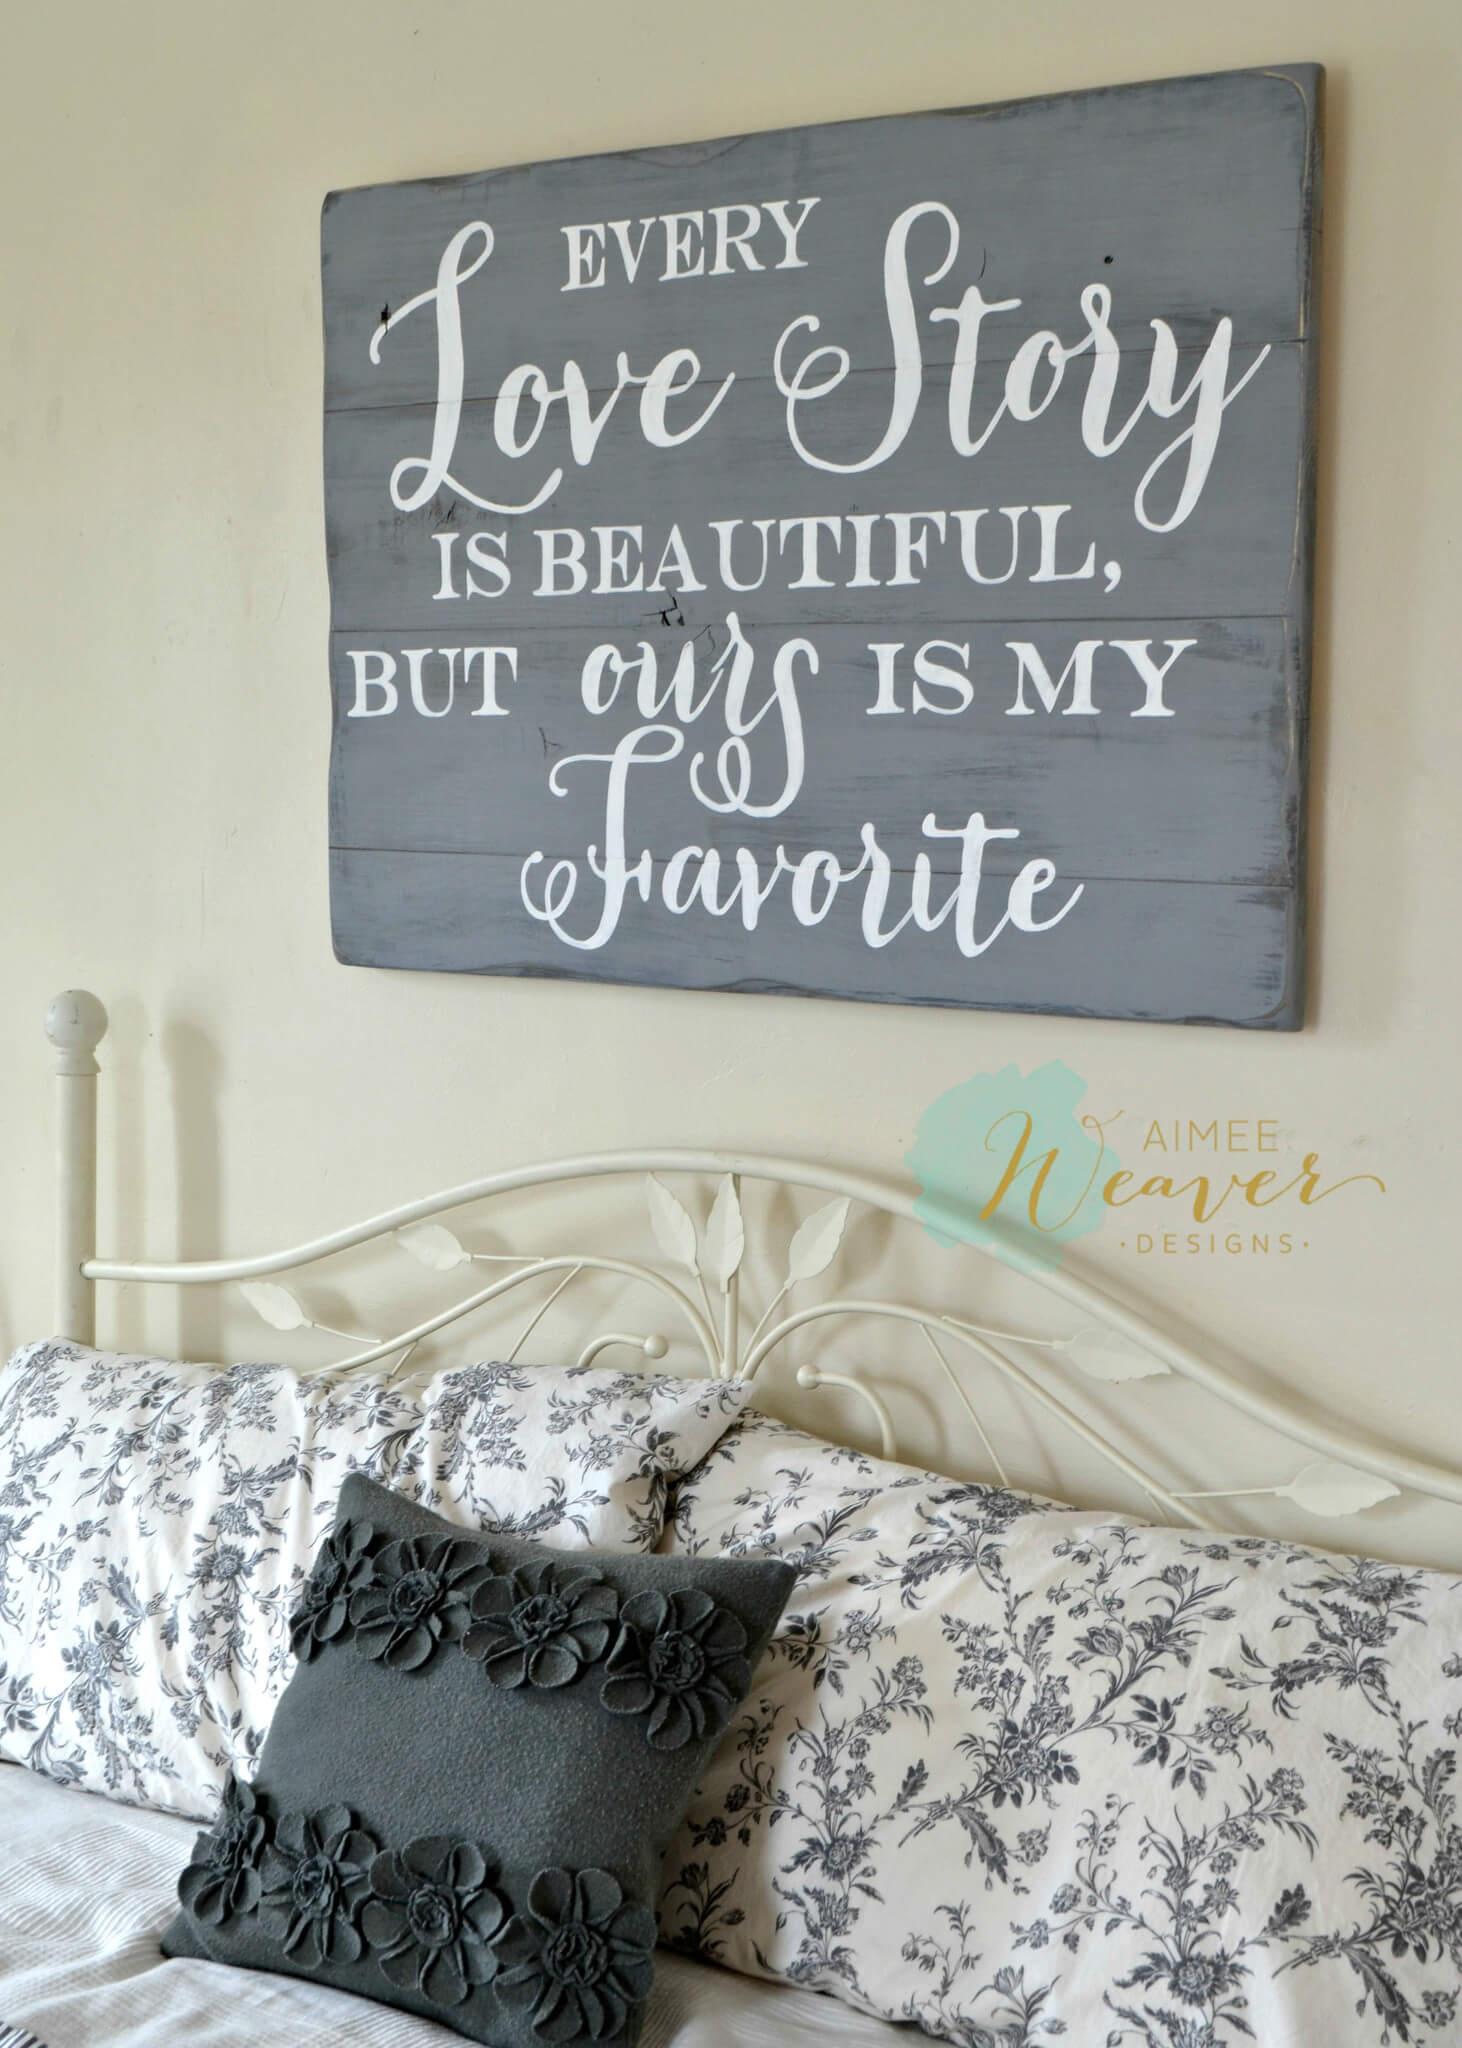 DIY Love Story Pallet Art